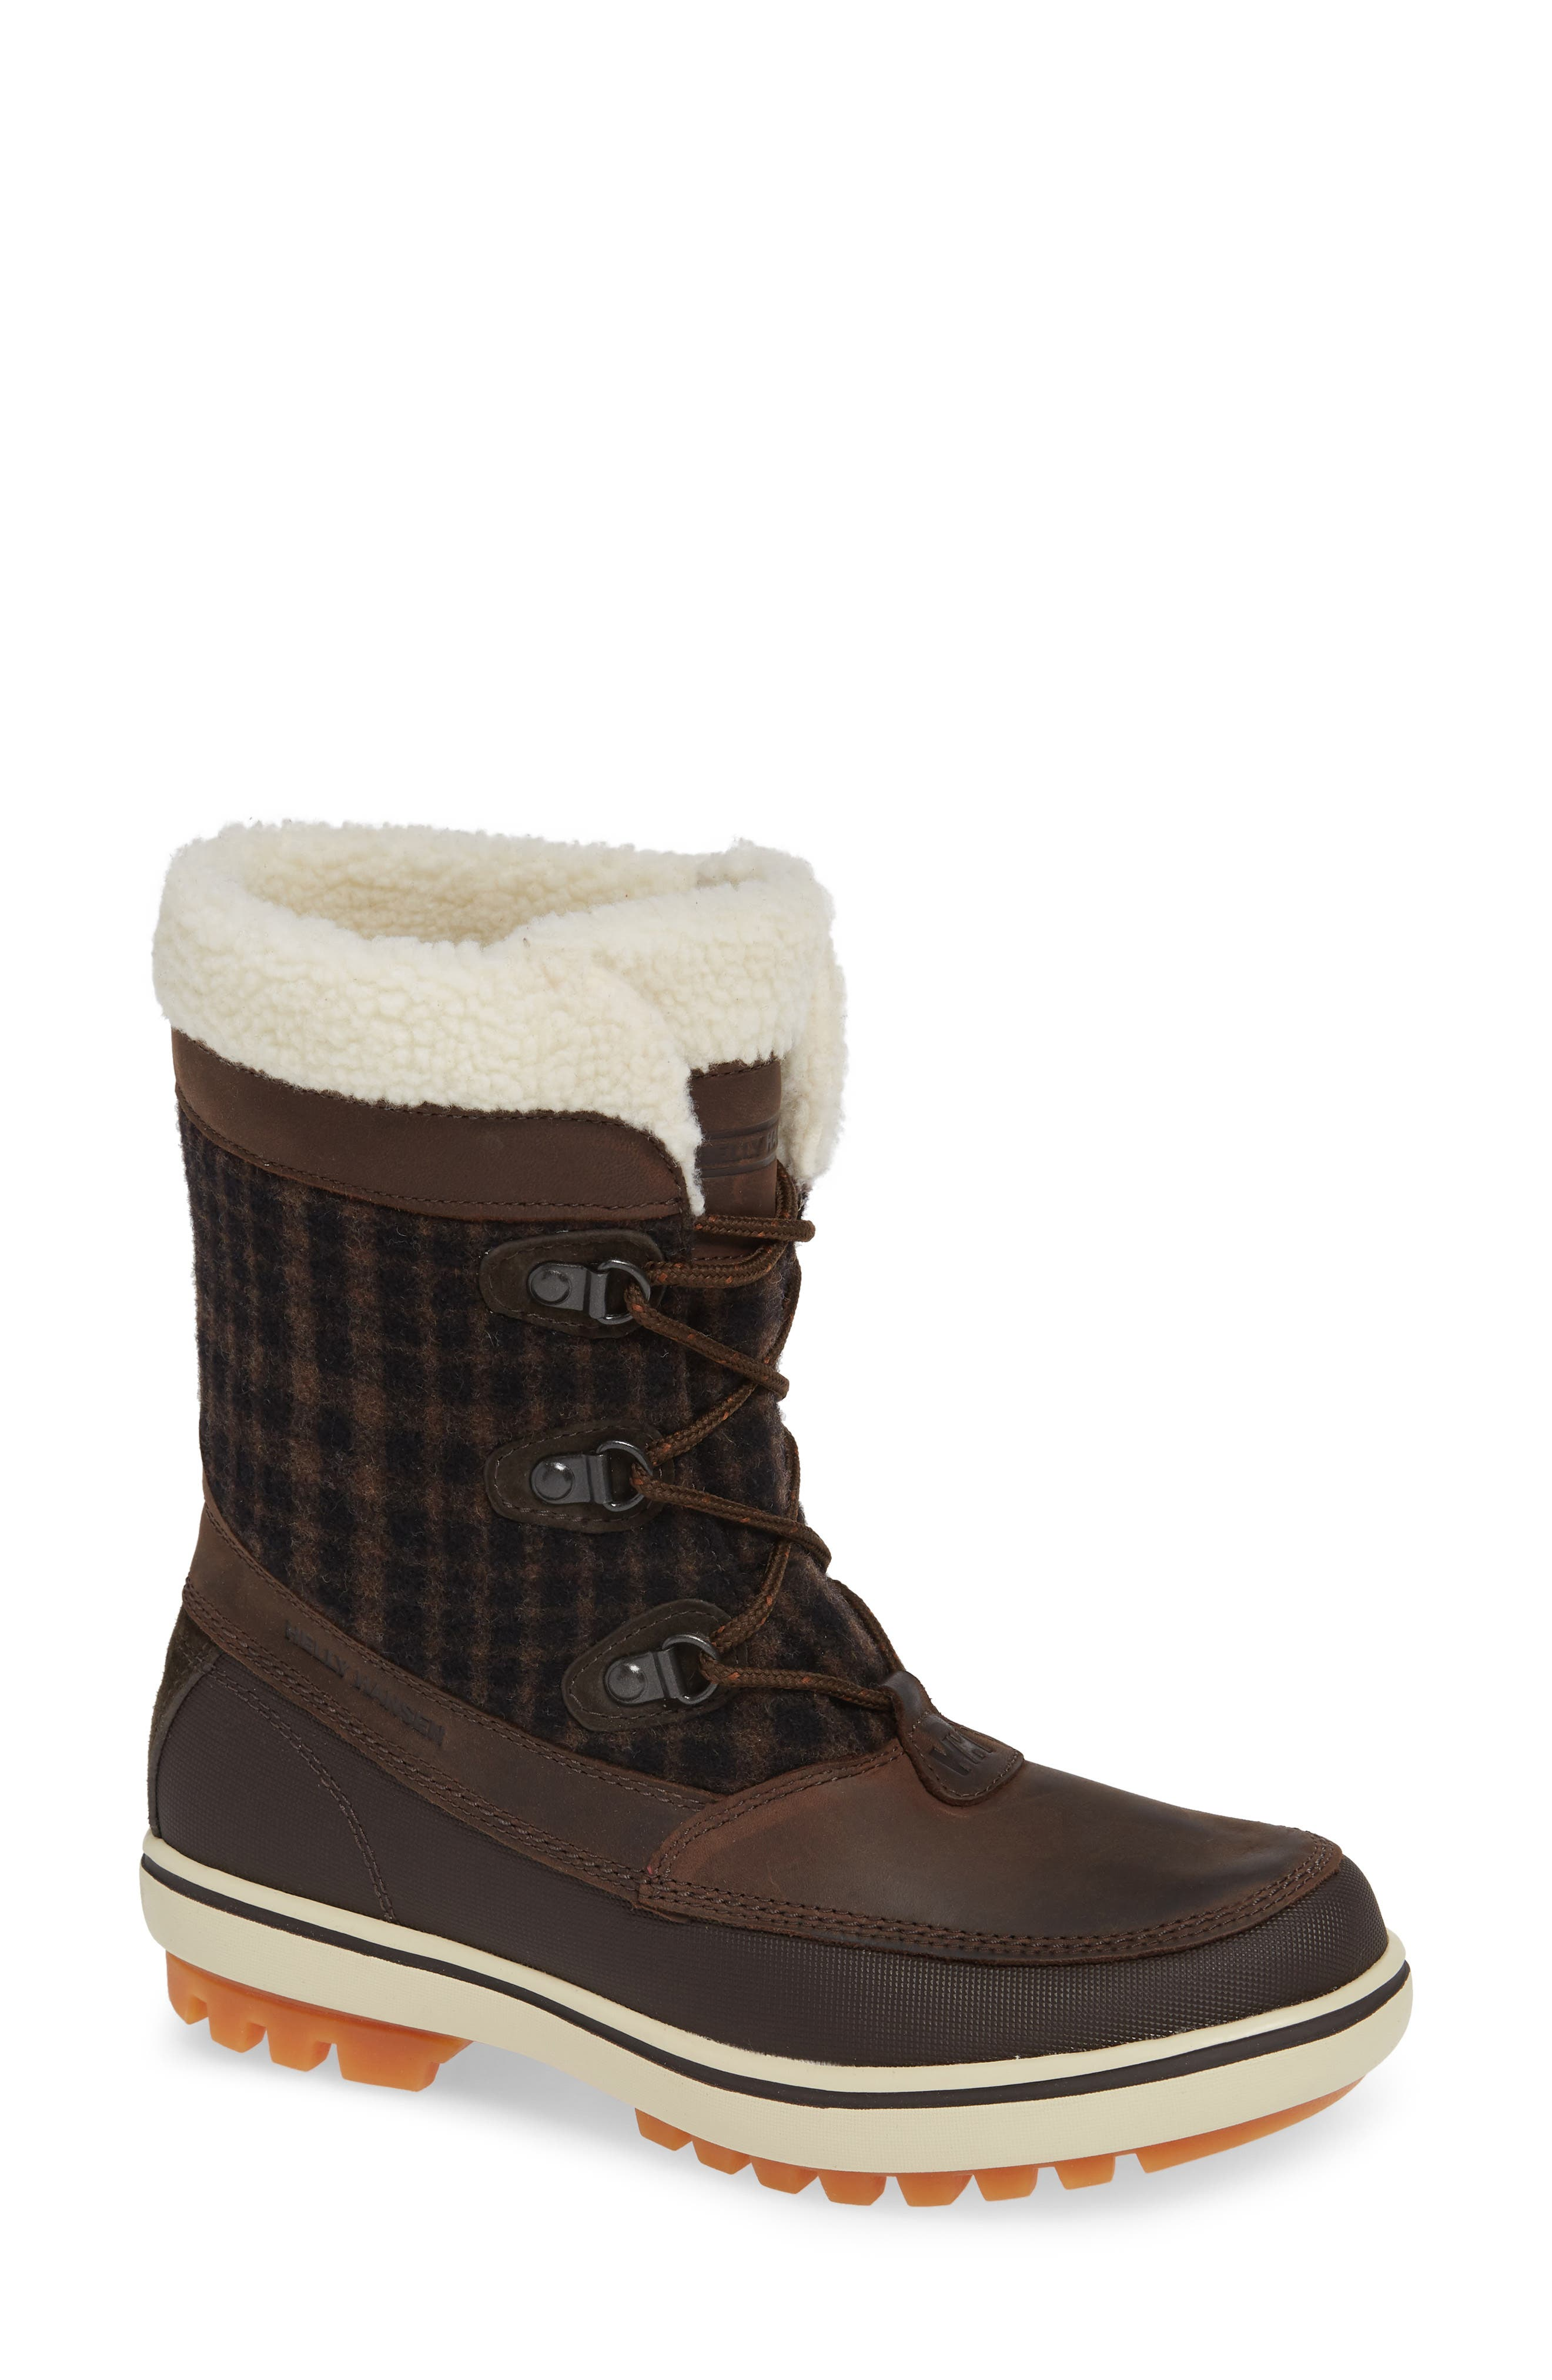 Georgina Snow Waterproof Boot in Clay/ Coffee Bean